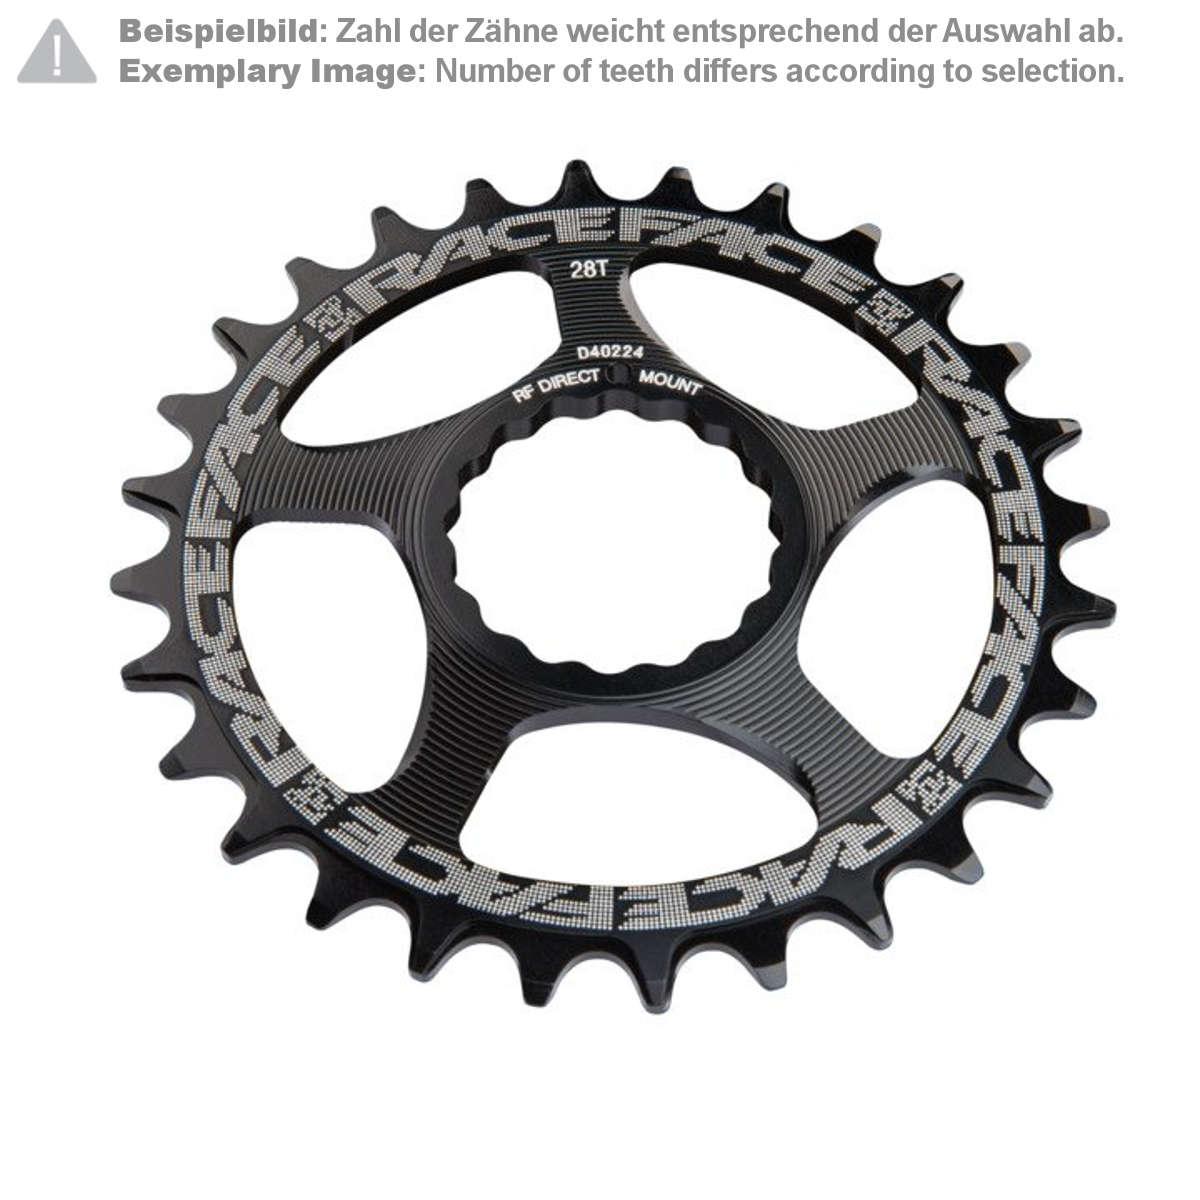 Race Face MTB-Kettenblatt  Schwarz, Direct Mount, Cinch, für 10/11/12-Fach